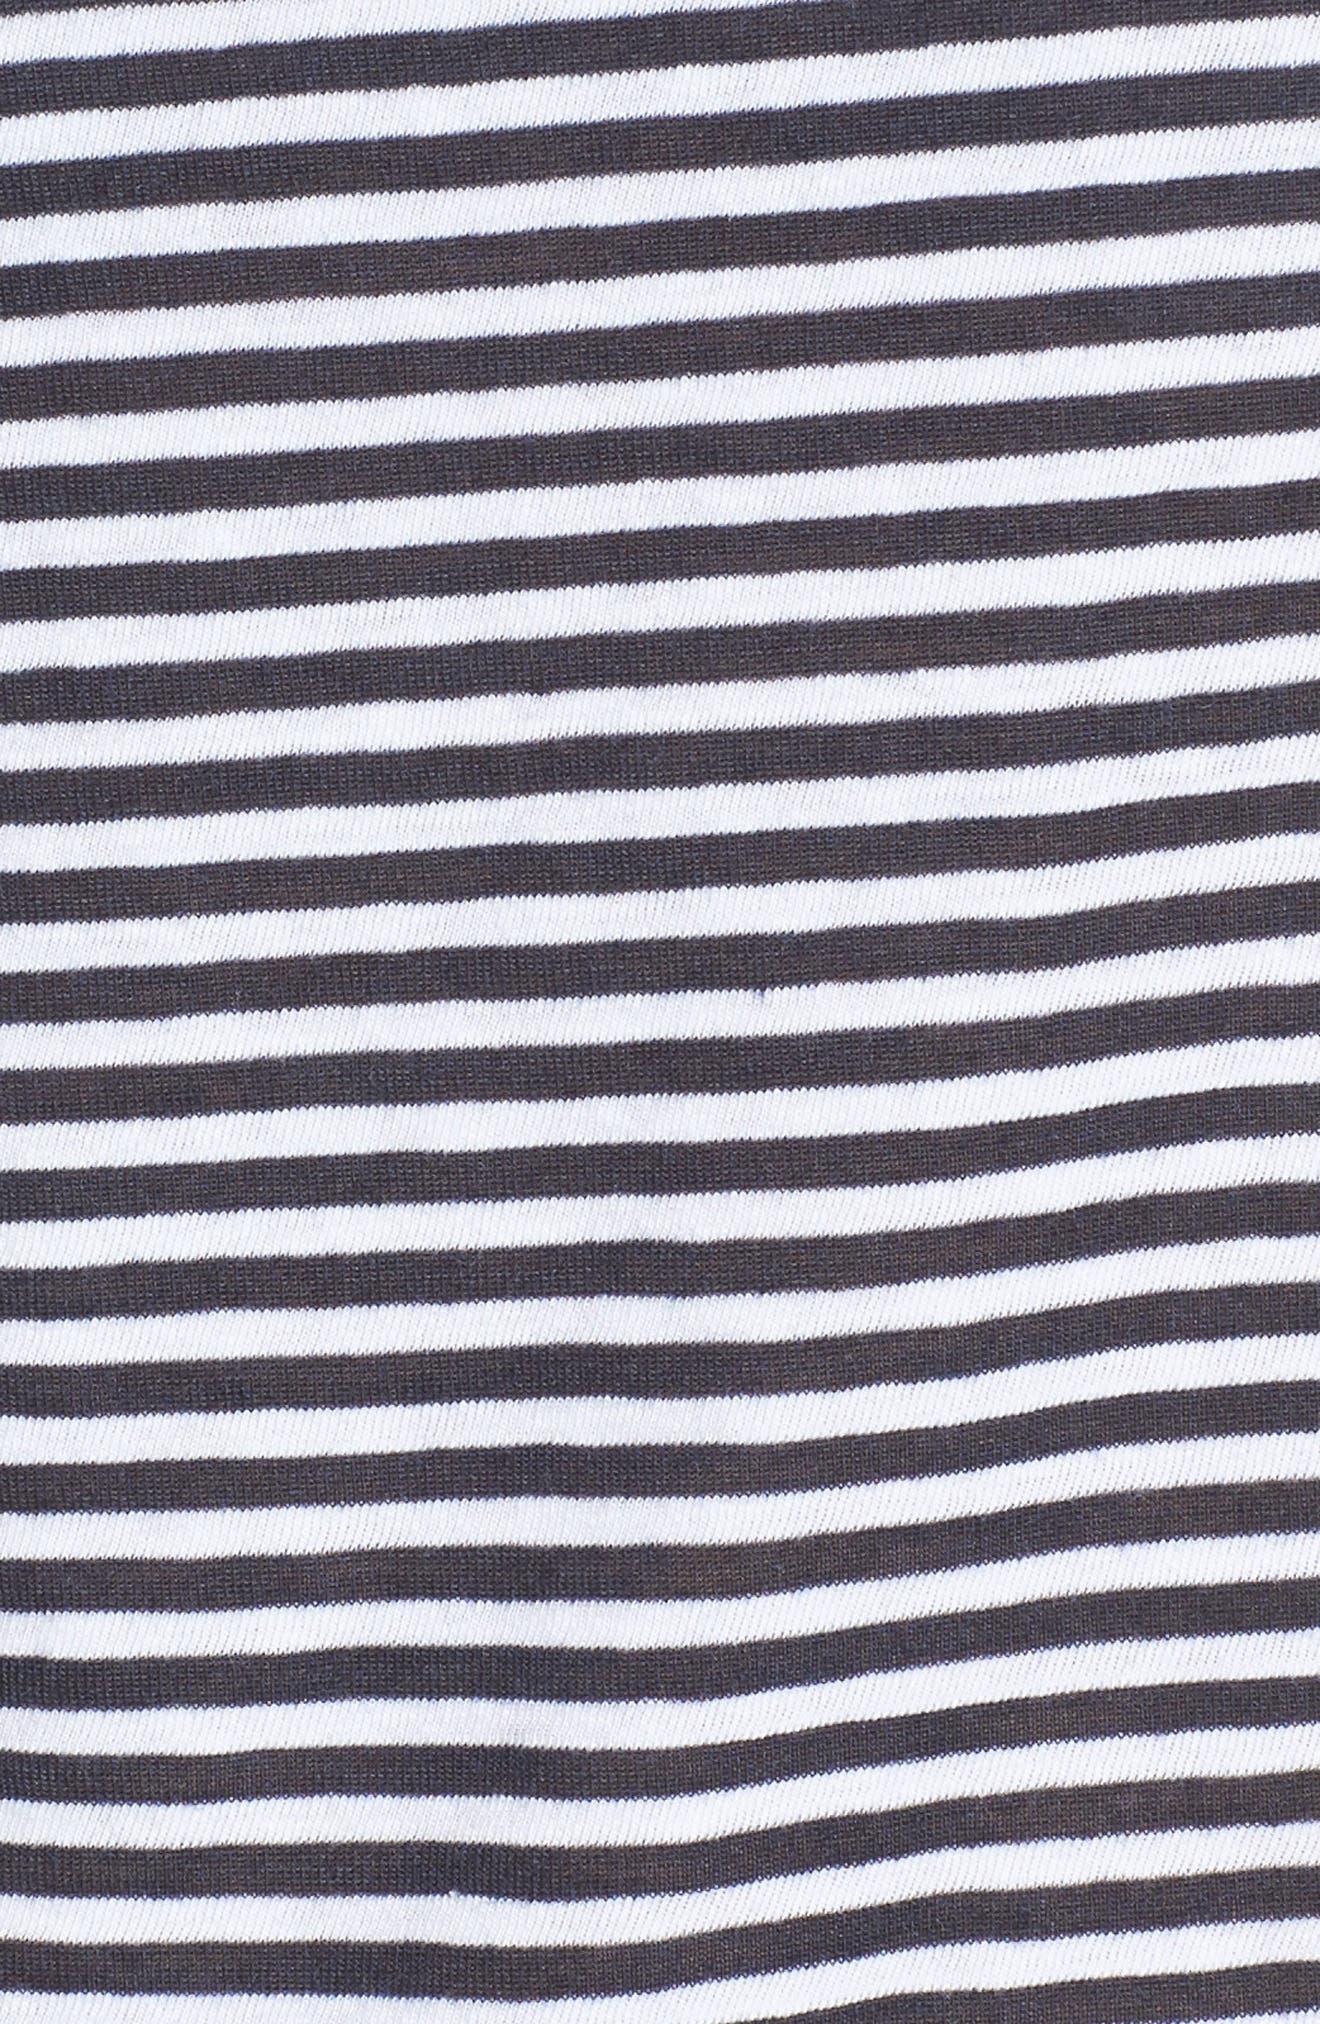 Lips Appliqué Stripe Tee,                             Alternate thumbnail 5, color,                             Navy